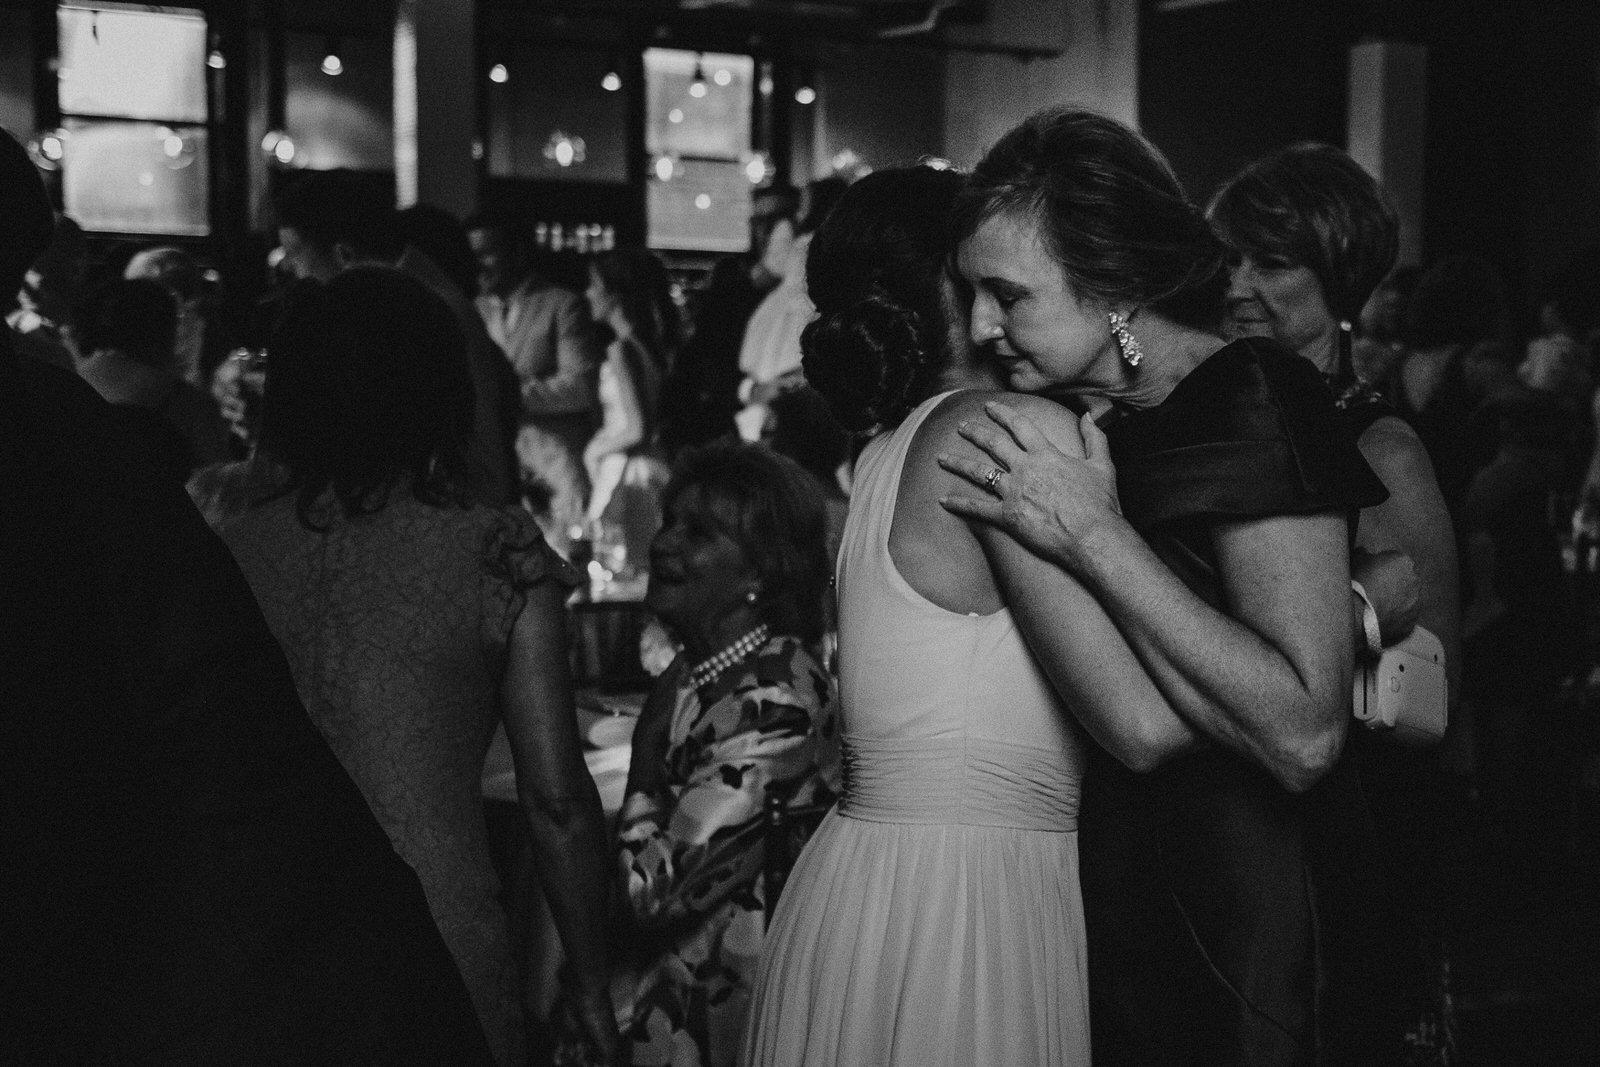 Oxford_Mississippi_wedding_photographer_37.JPG